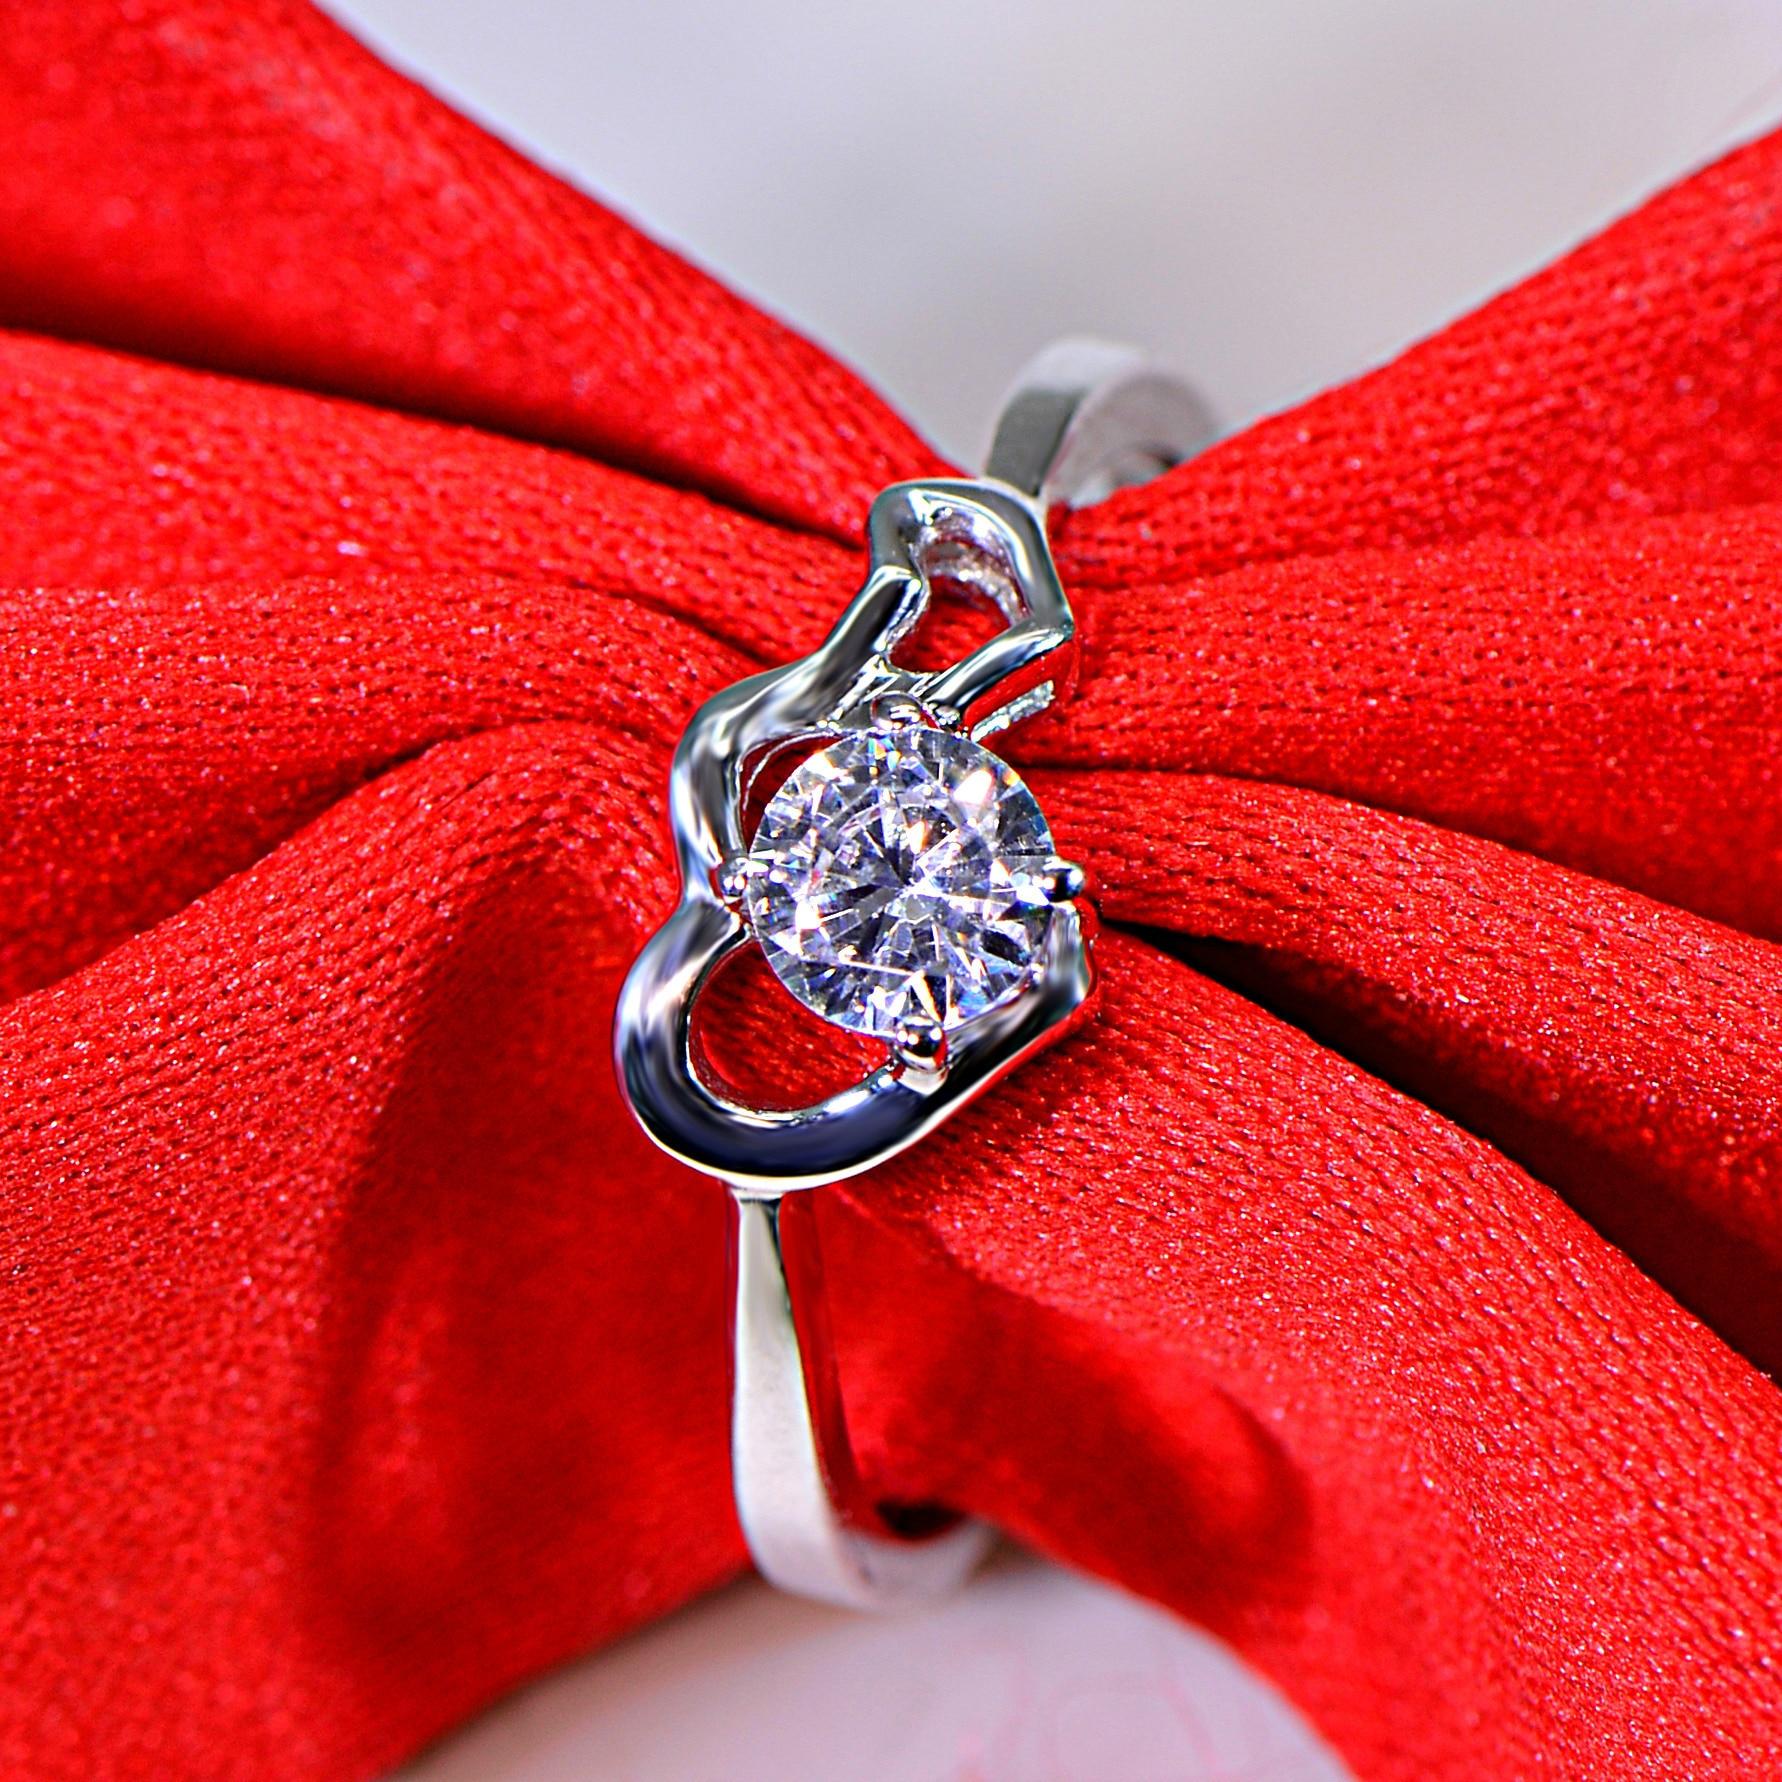 0.3 carat romantic silver micro set high carbon man made diamond heart ring for women (JSA)